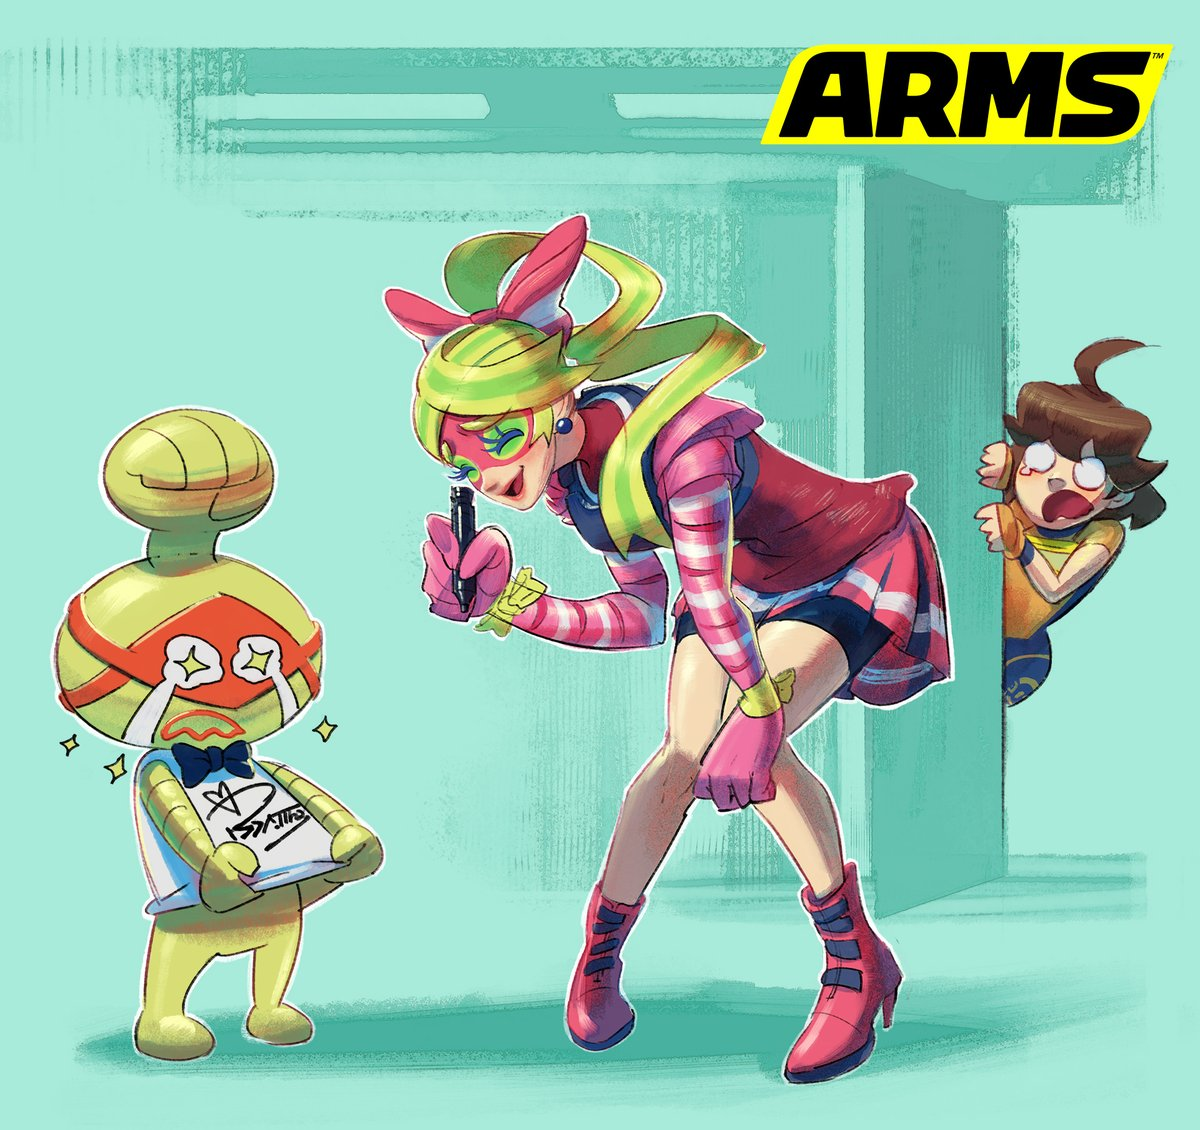 『ARMS』 バイト&バークとコブッシーのアートワークが公開